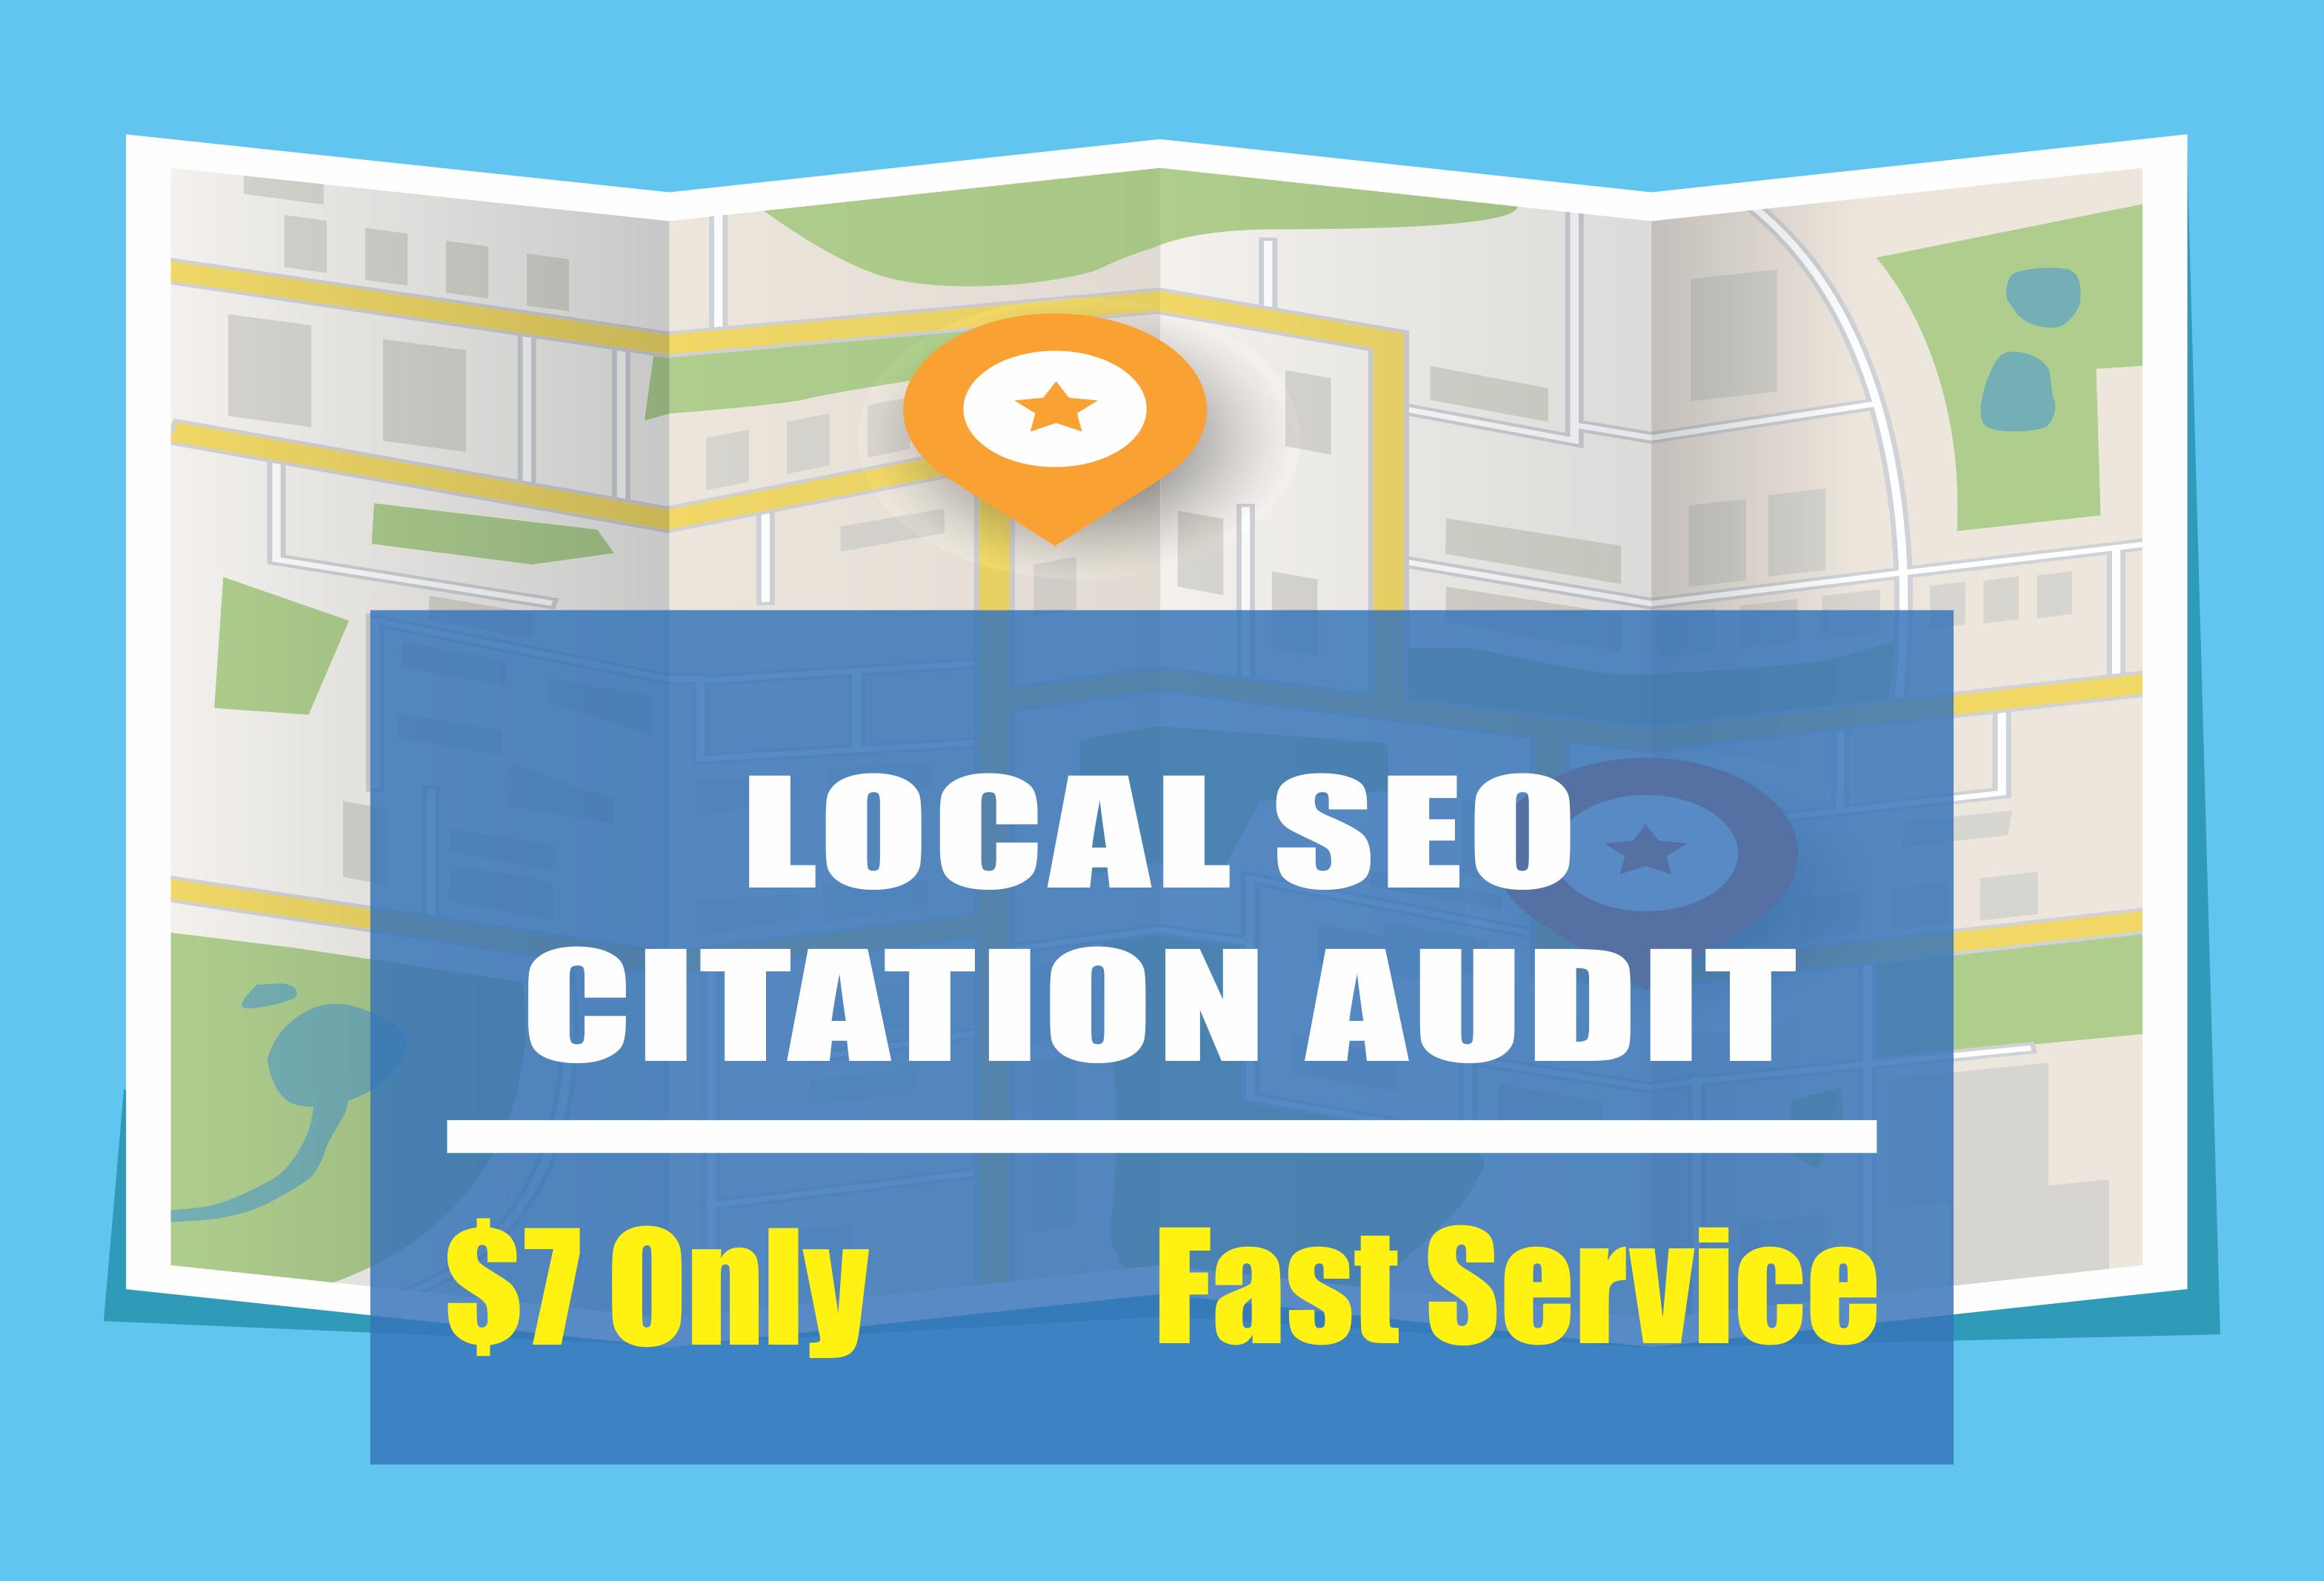 Complete Local SEO Citation Audit